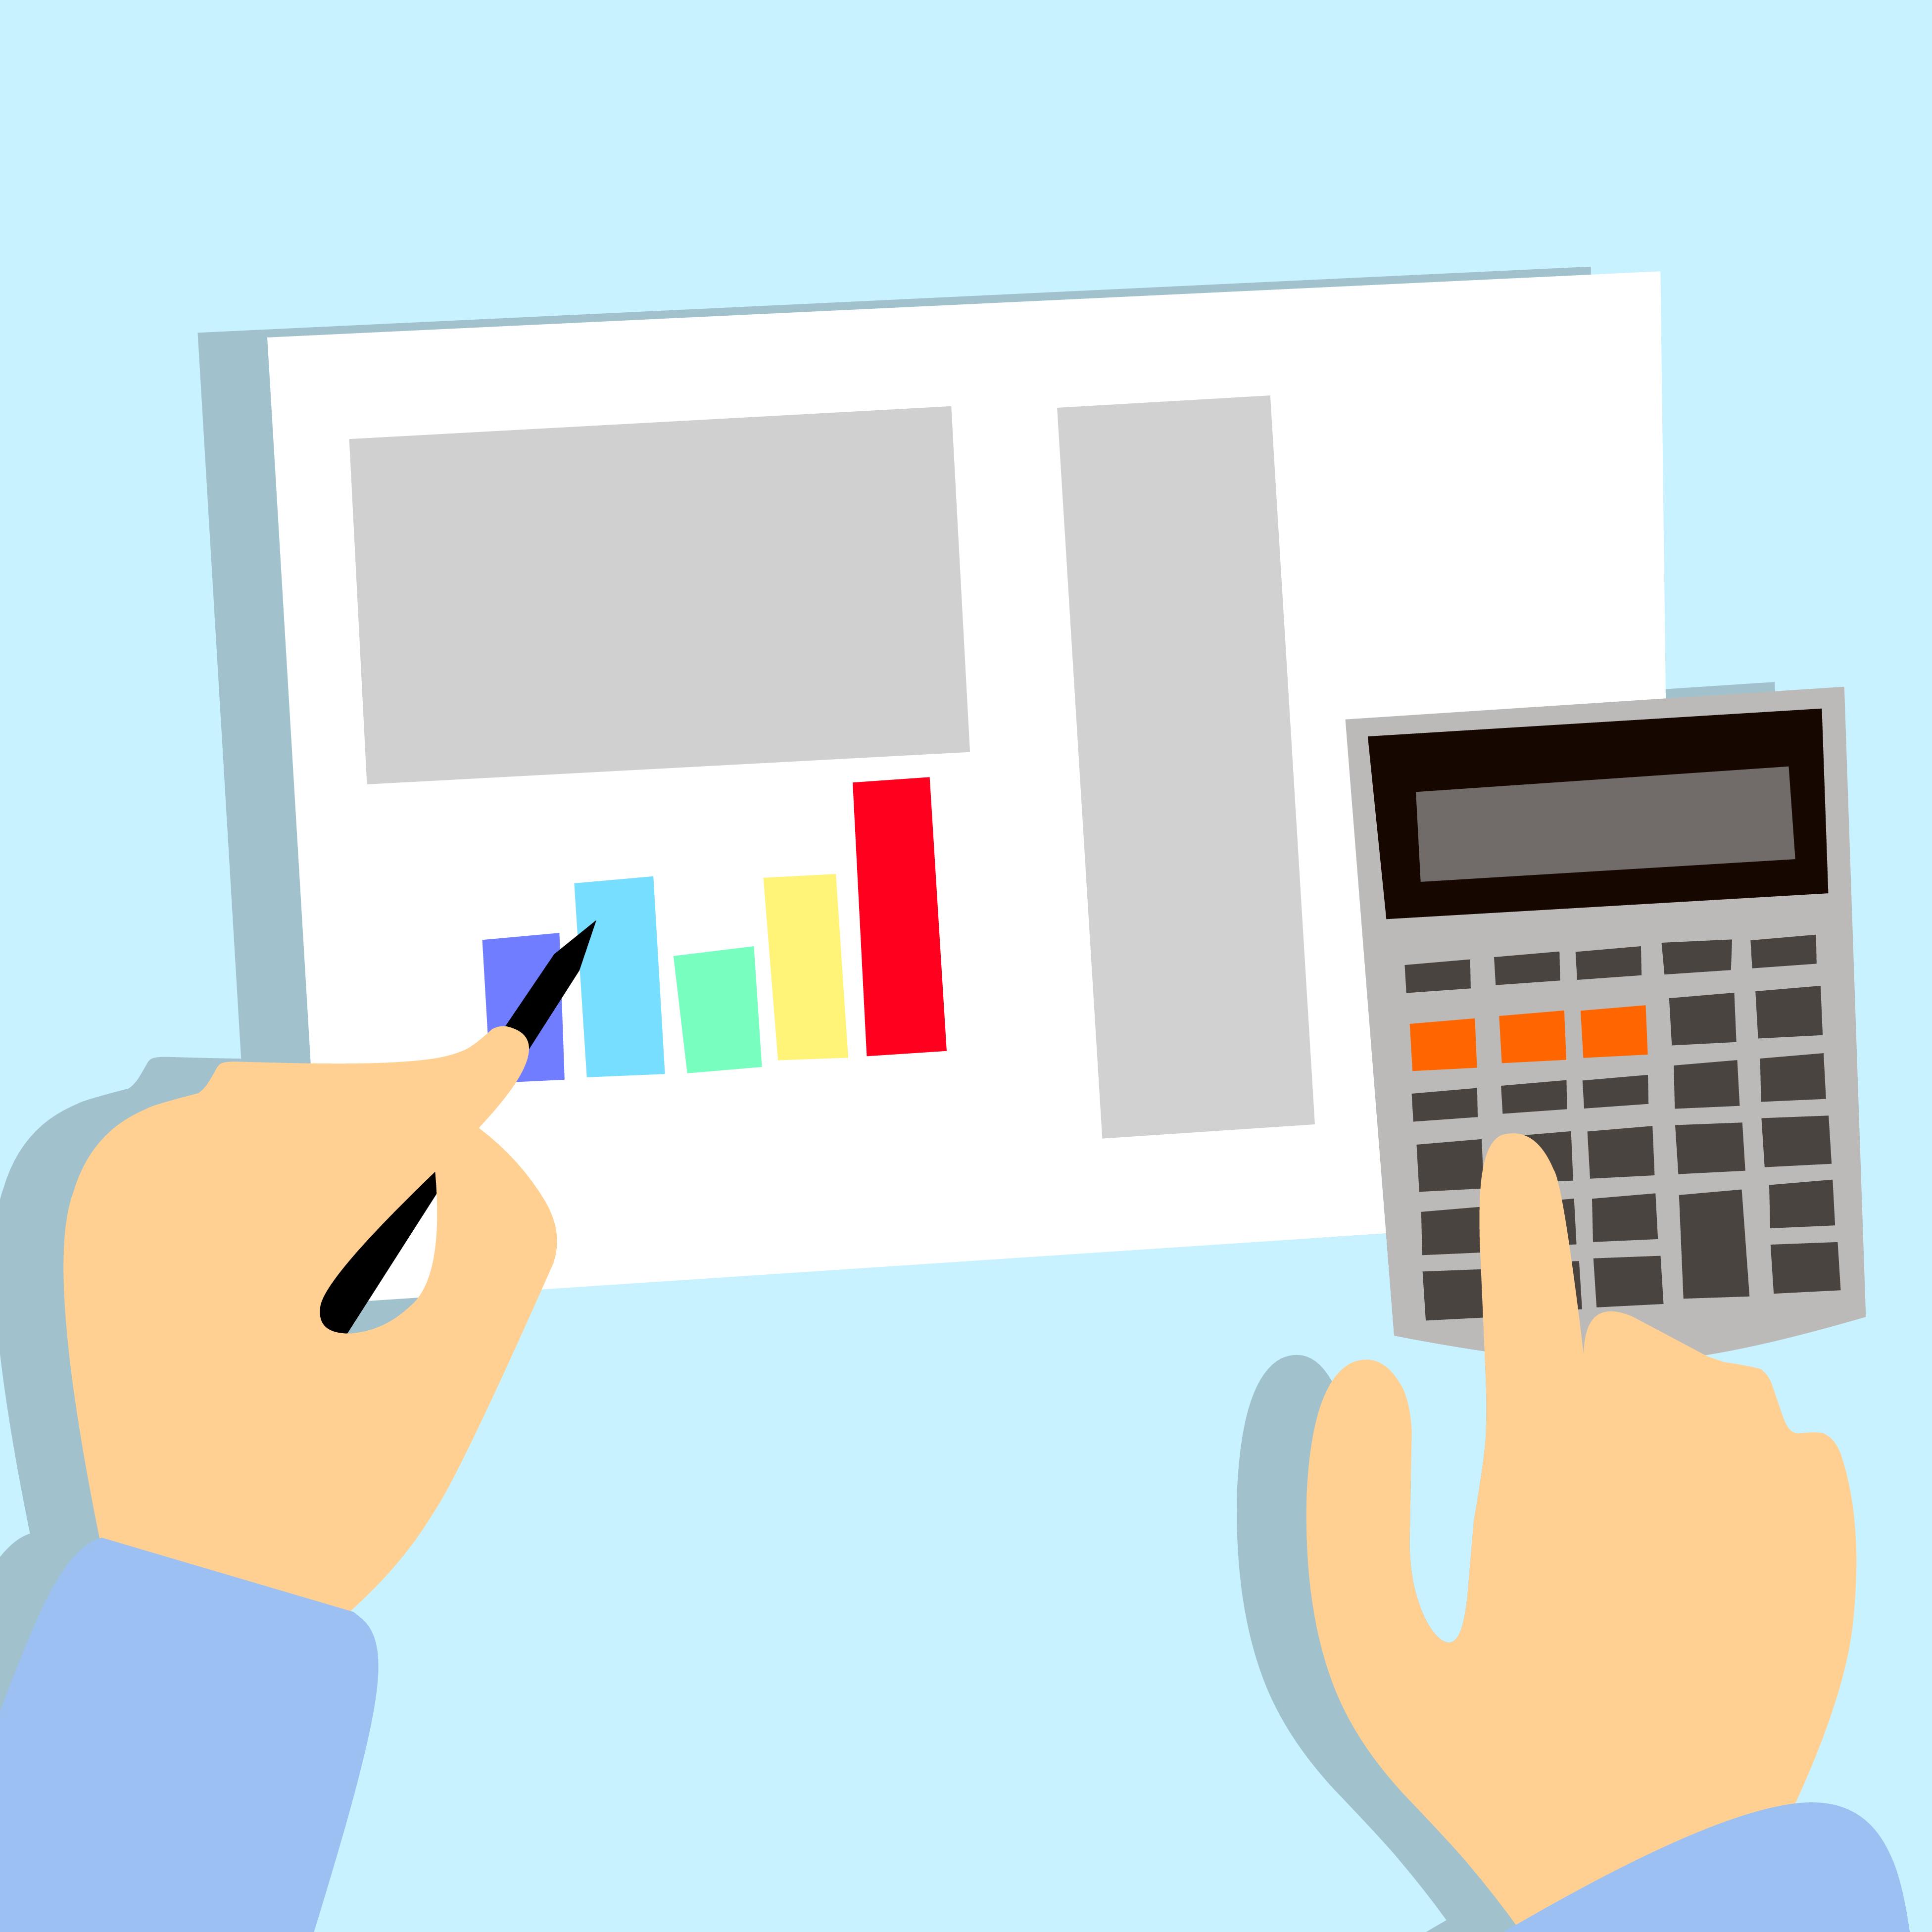 accountancy, analyzing, banking